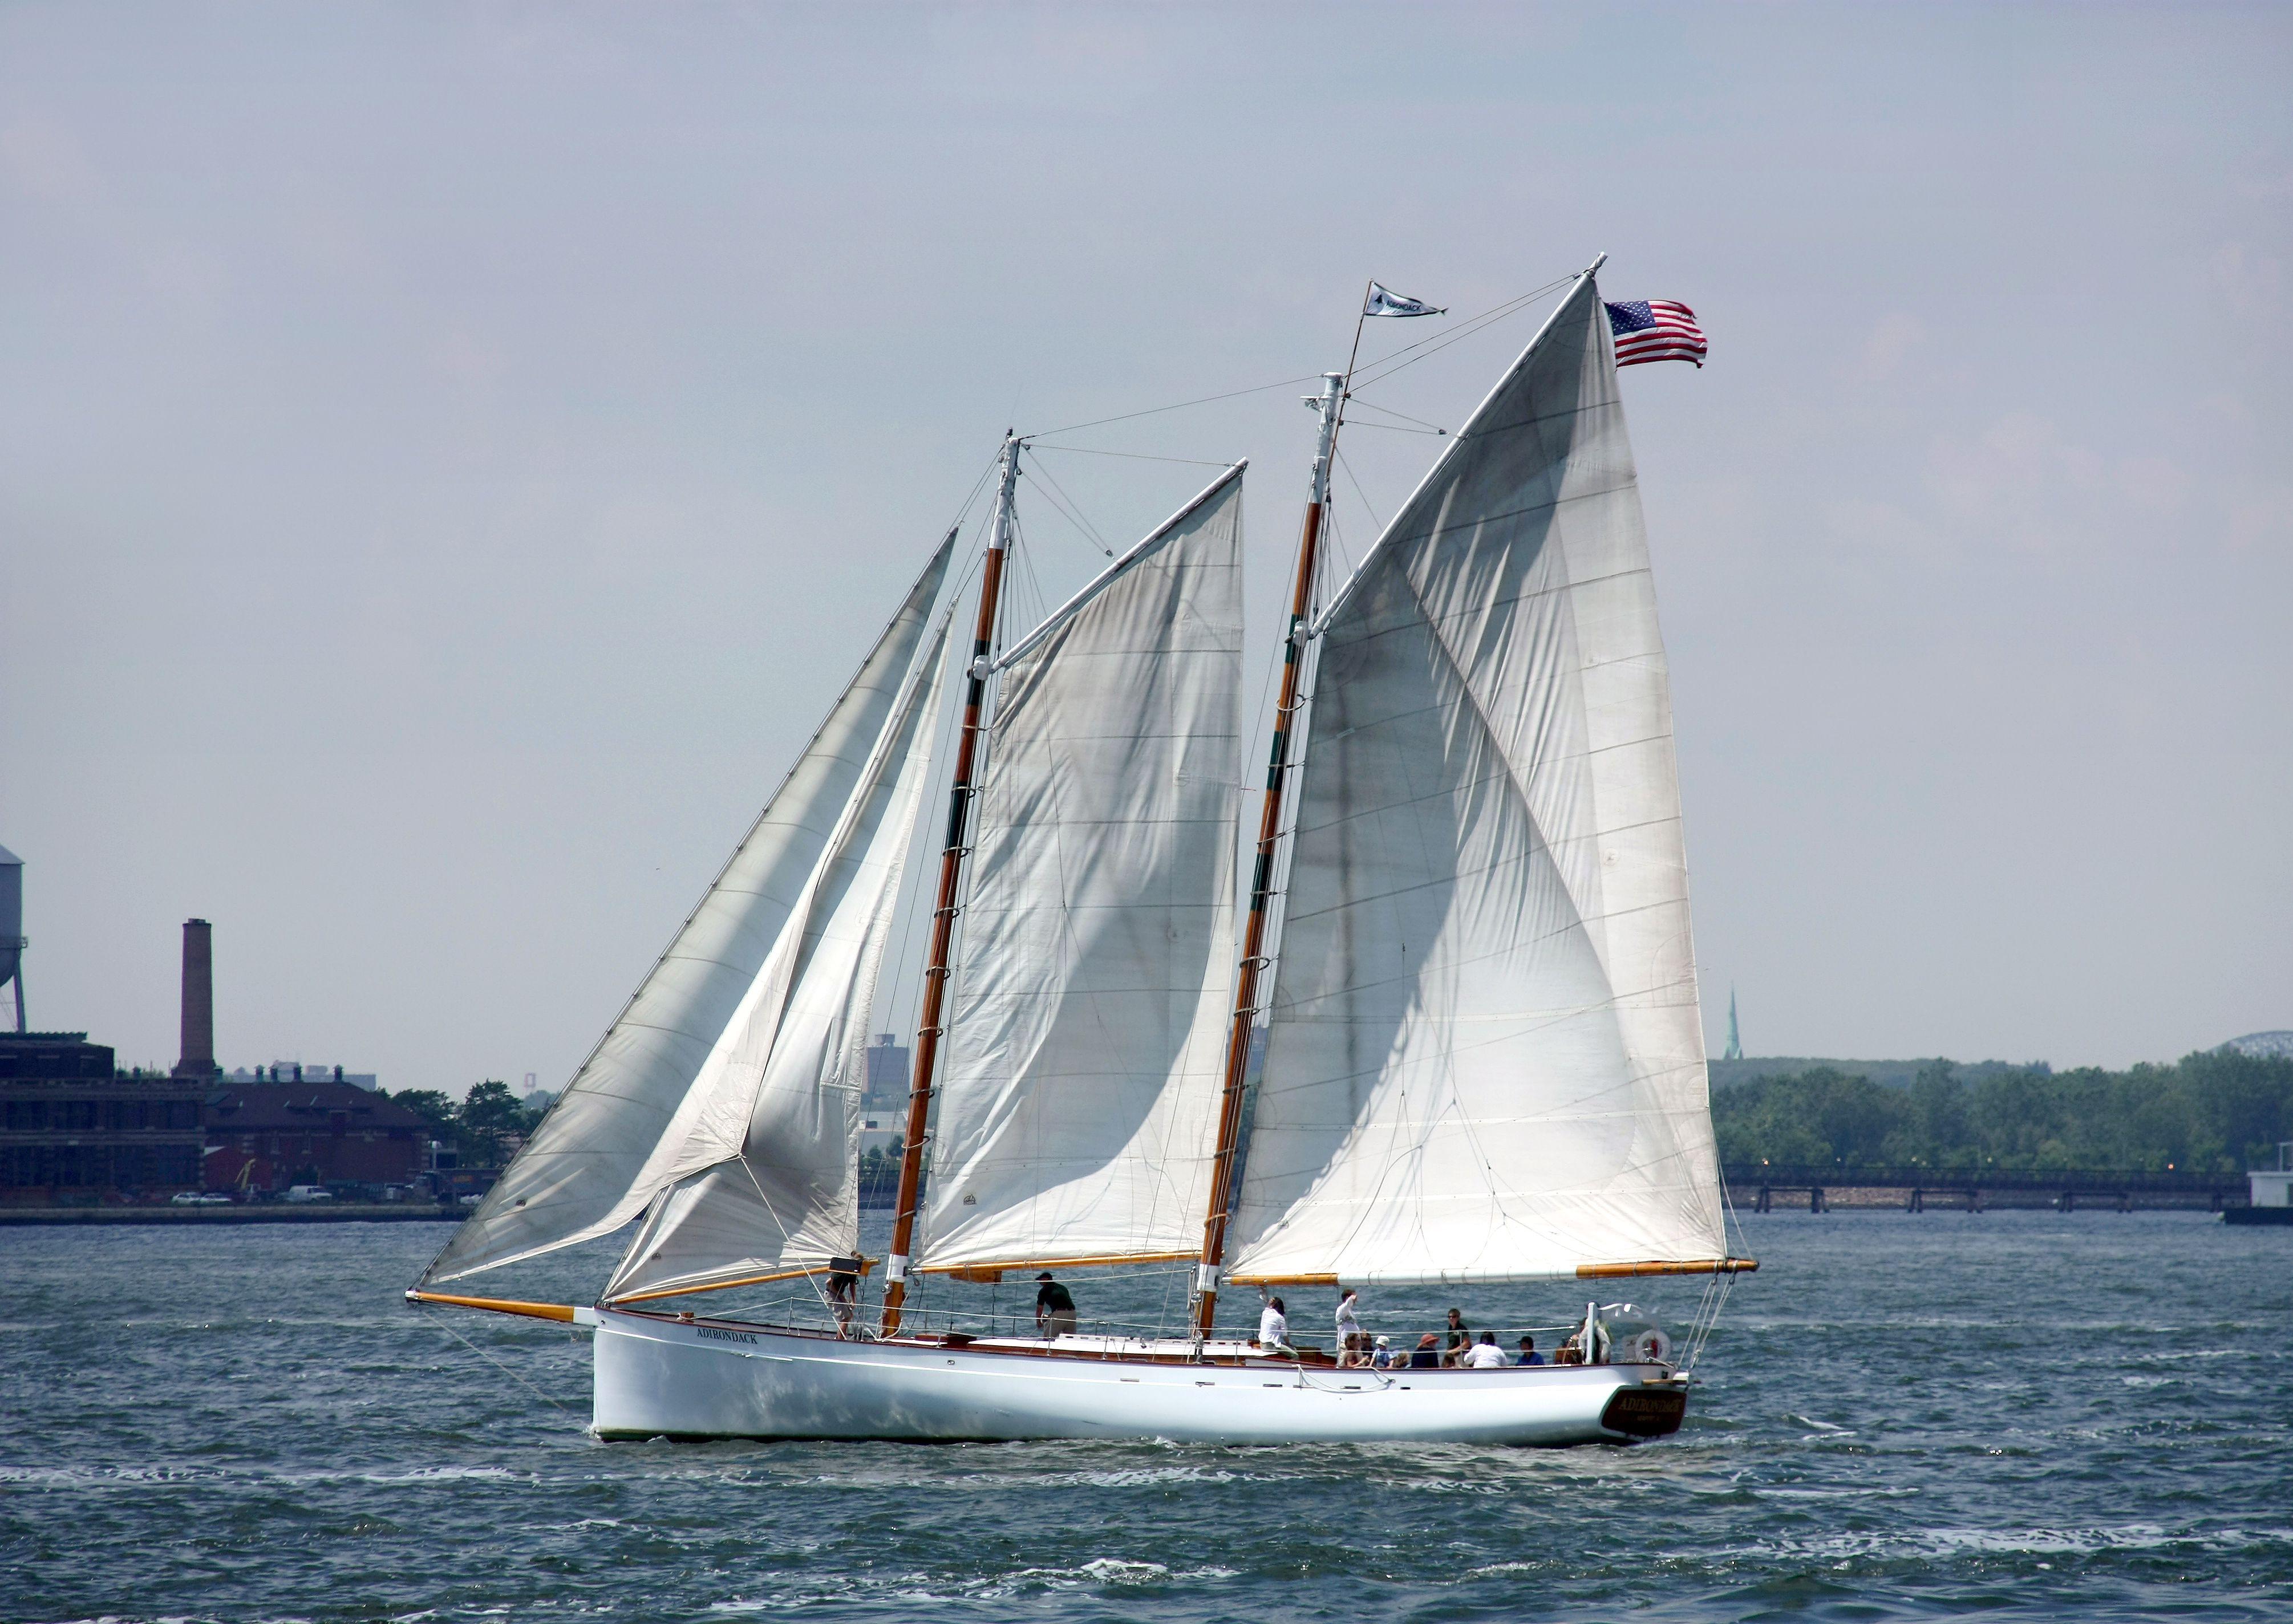 The gaff-rigged schooner Adirondack